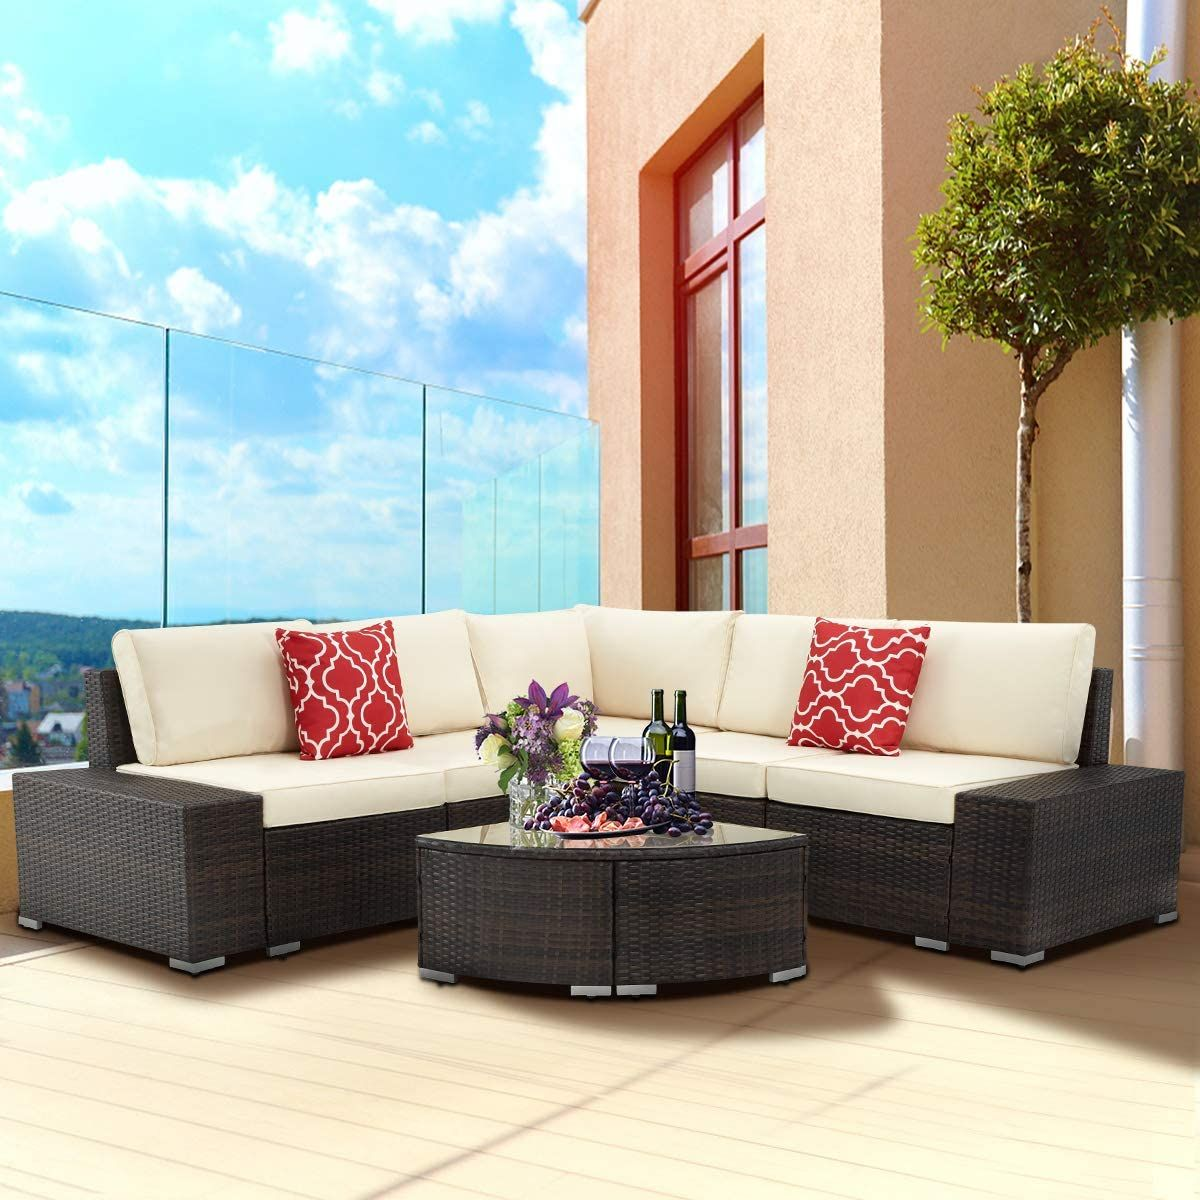 6 Piece Outdoor Patio Furniture Set Pe Rattan All Weather Wicker Sofa Set Ou In 2020 Outdoor Sectional Furniture Outdoor Patio Furniture Sets Outdoor Patio Furniture